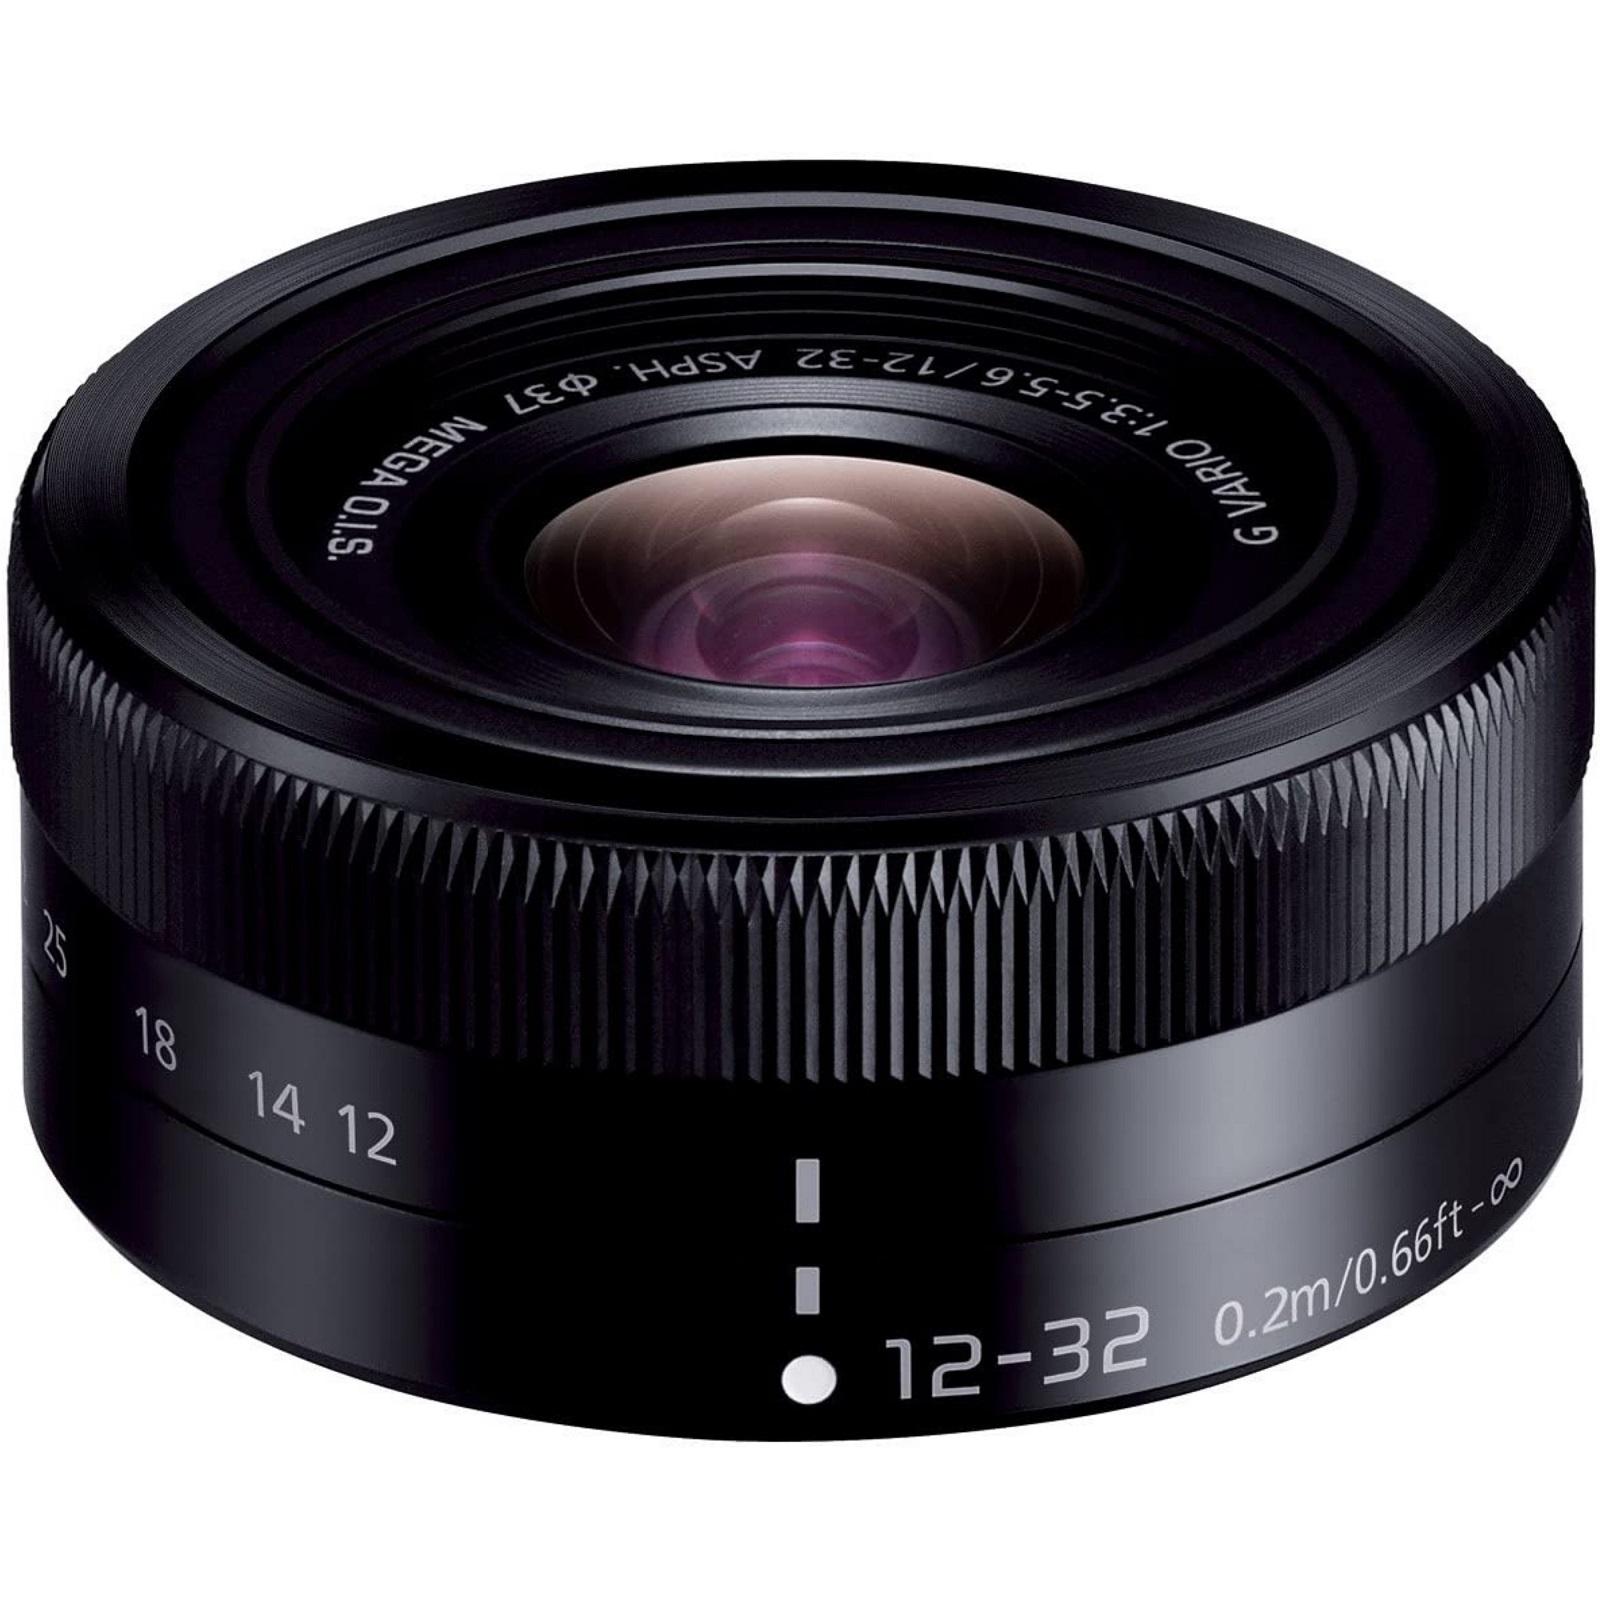 Panasonic パナソニック ルミックス G VARIO 12-32mm F3.5-5.6 ASPH./MEGA O.I.S. ブラック 新品 (簡易箱)